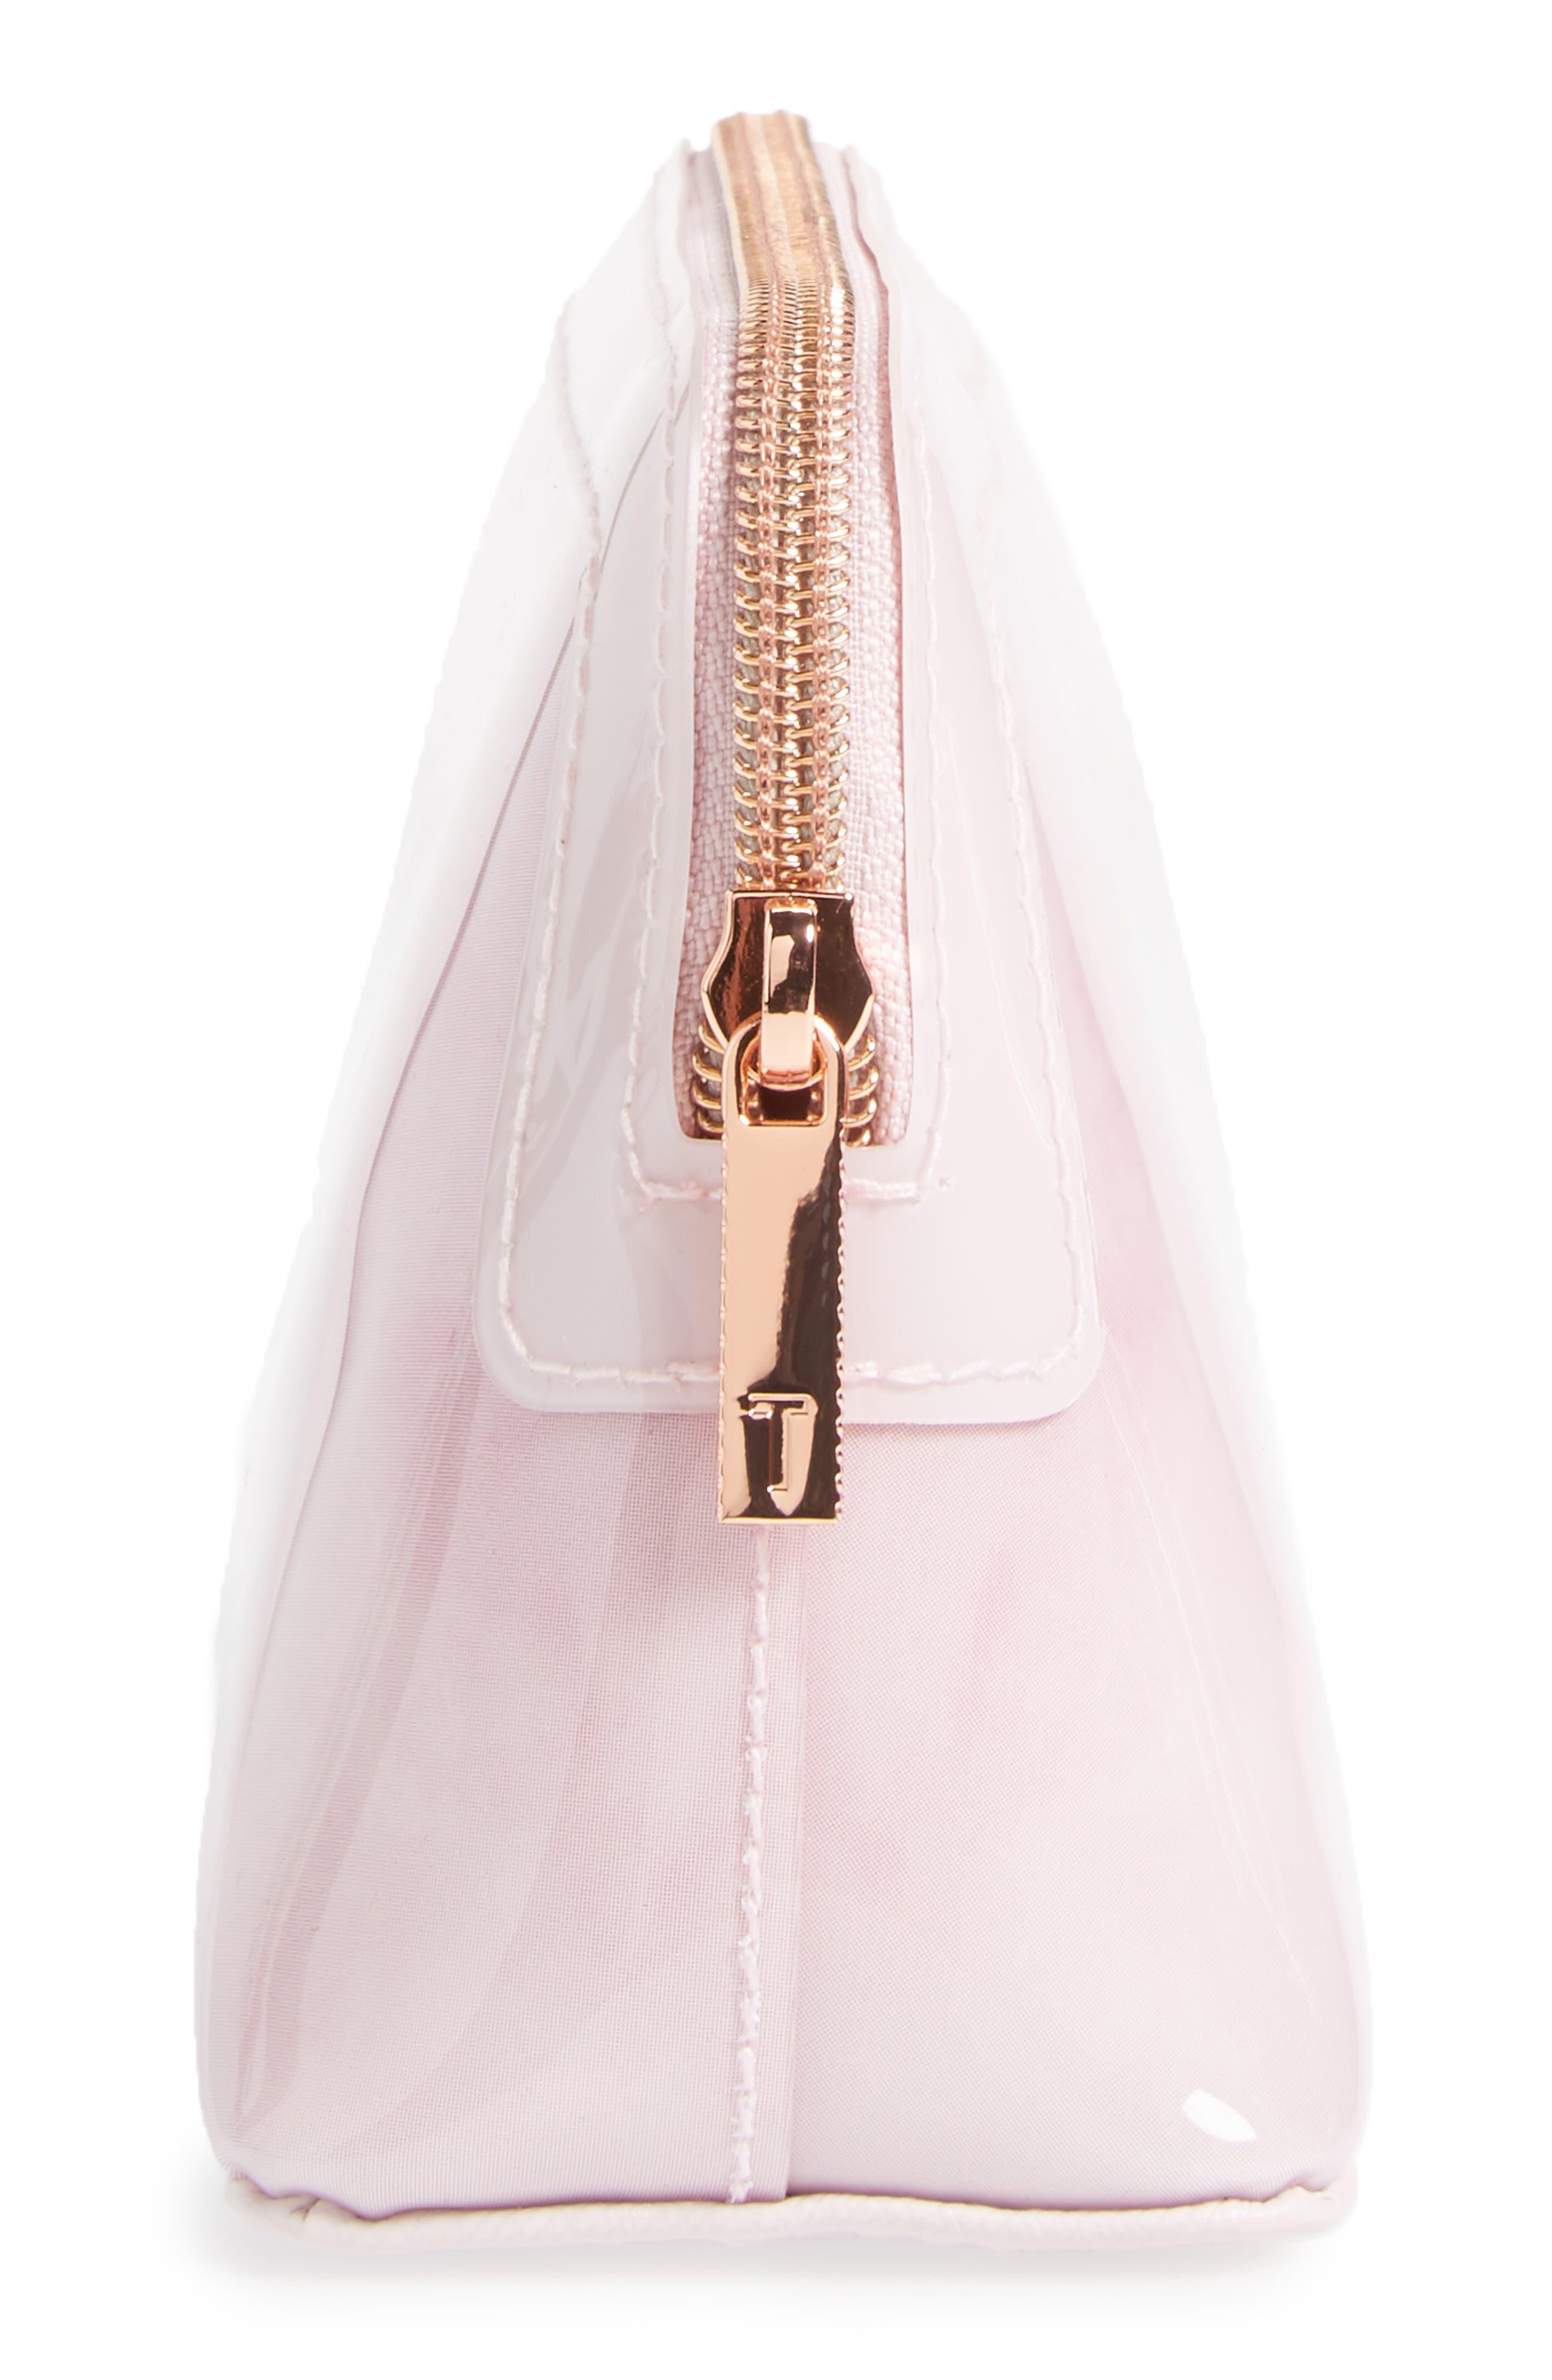 Zandra - Rose Quartz Cosmetics Bag,                             Alternate thumbnail 4, color,                             672